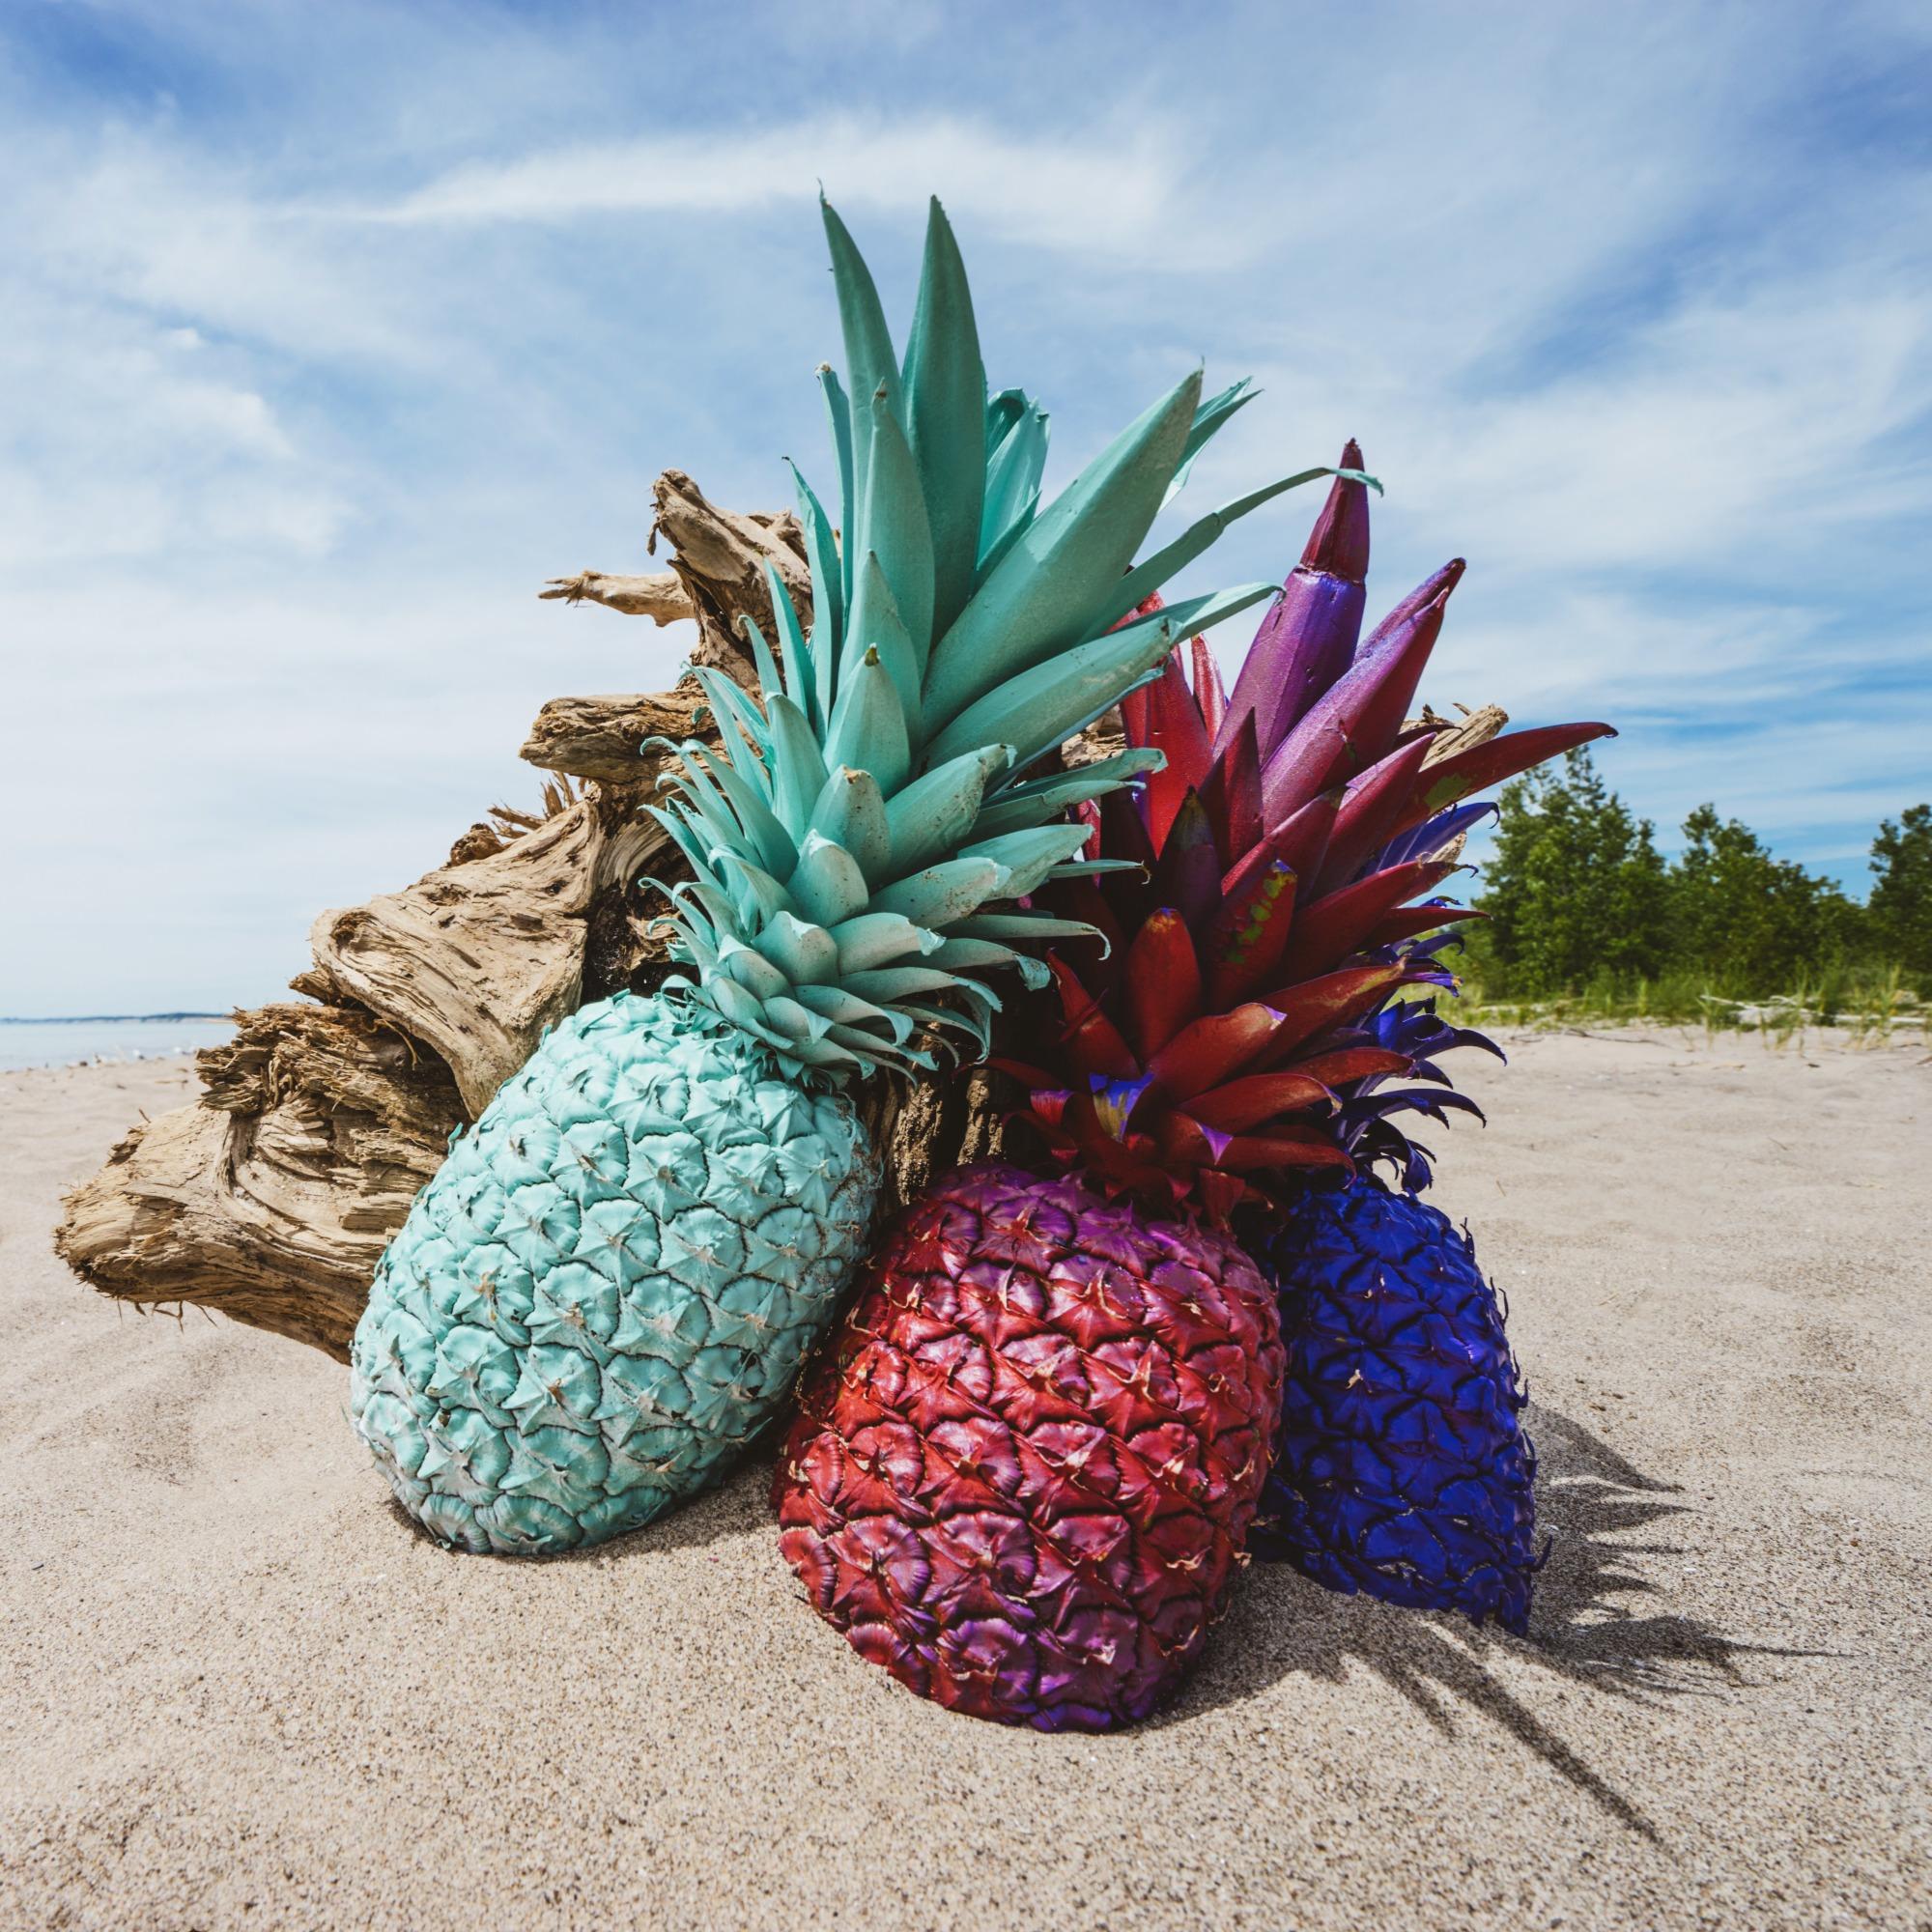 pineapple-supply-co-nd0auAKqUu0-unsplash